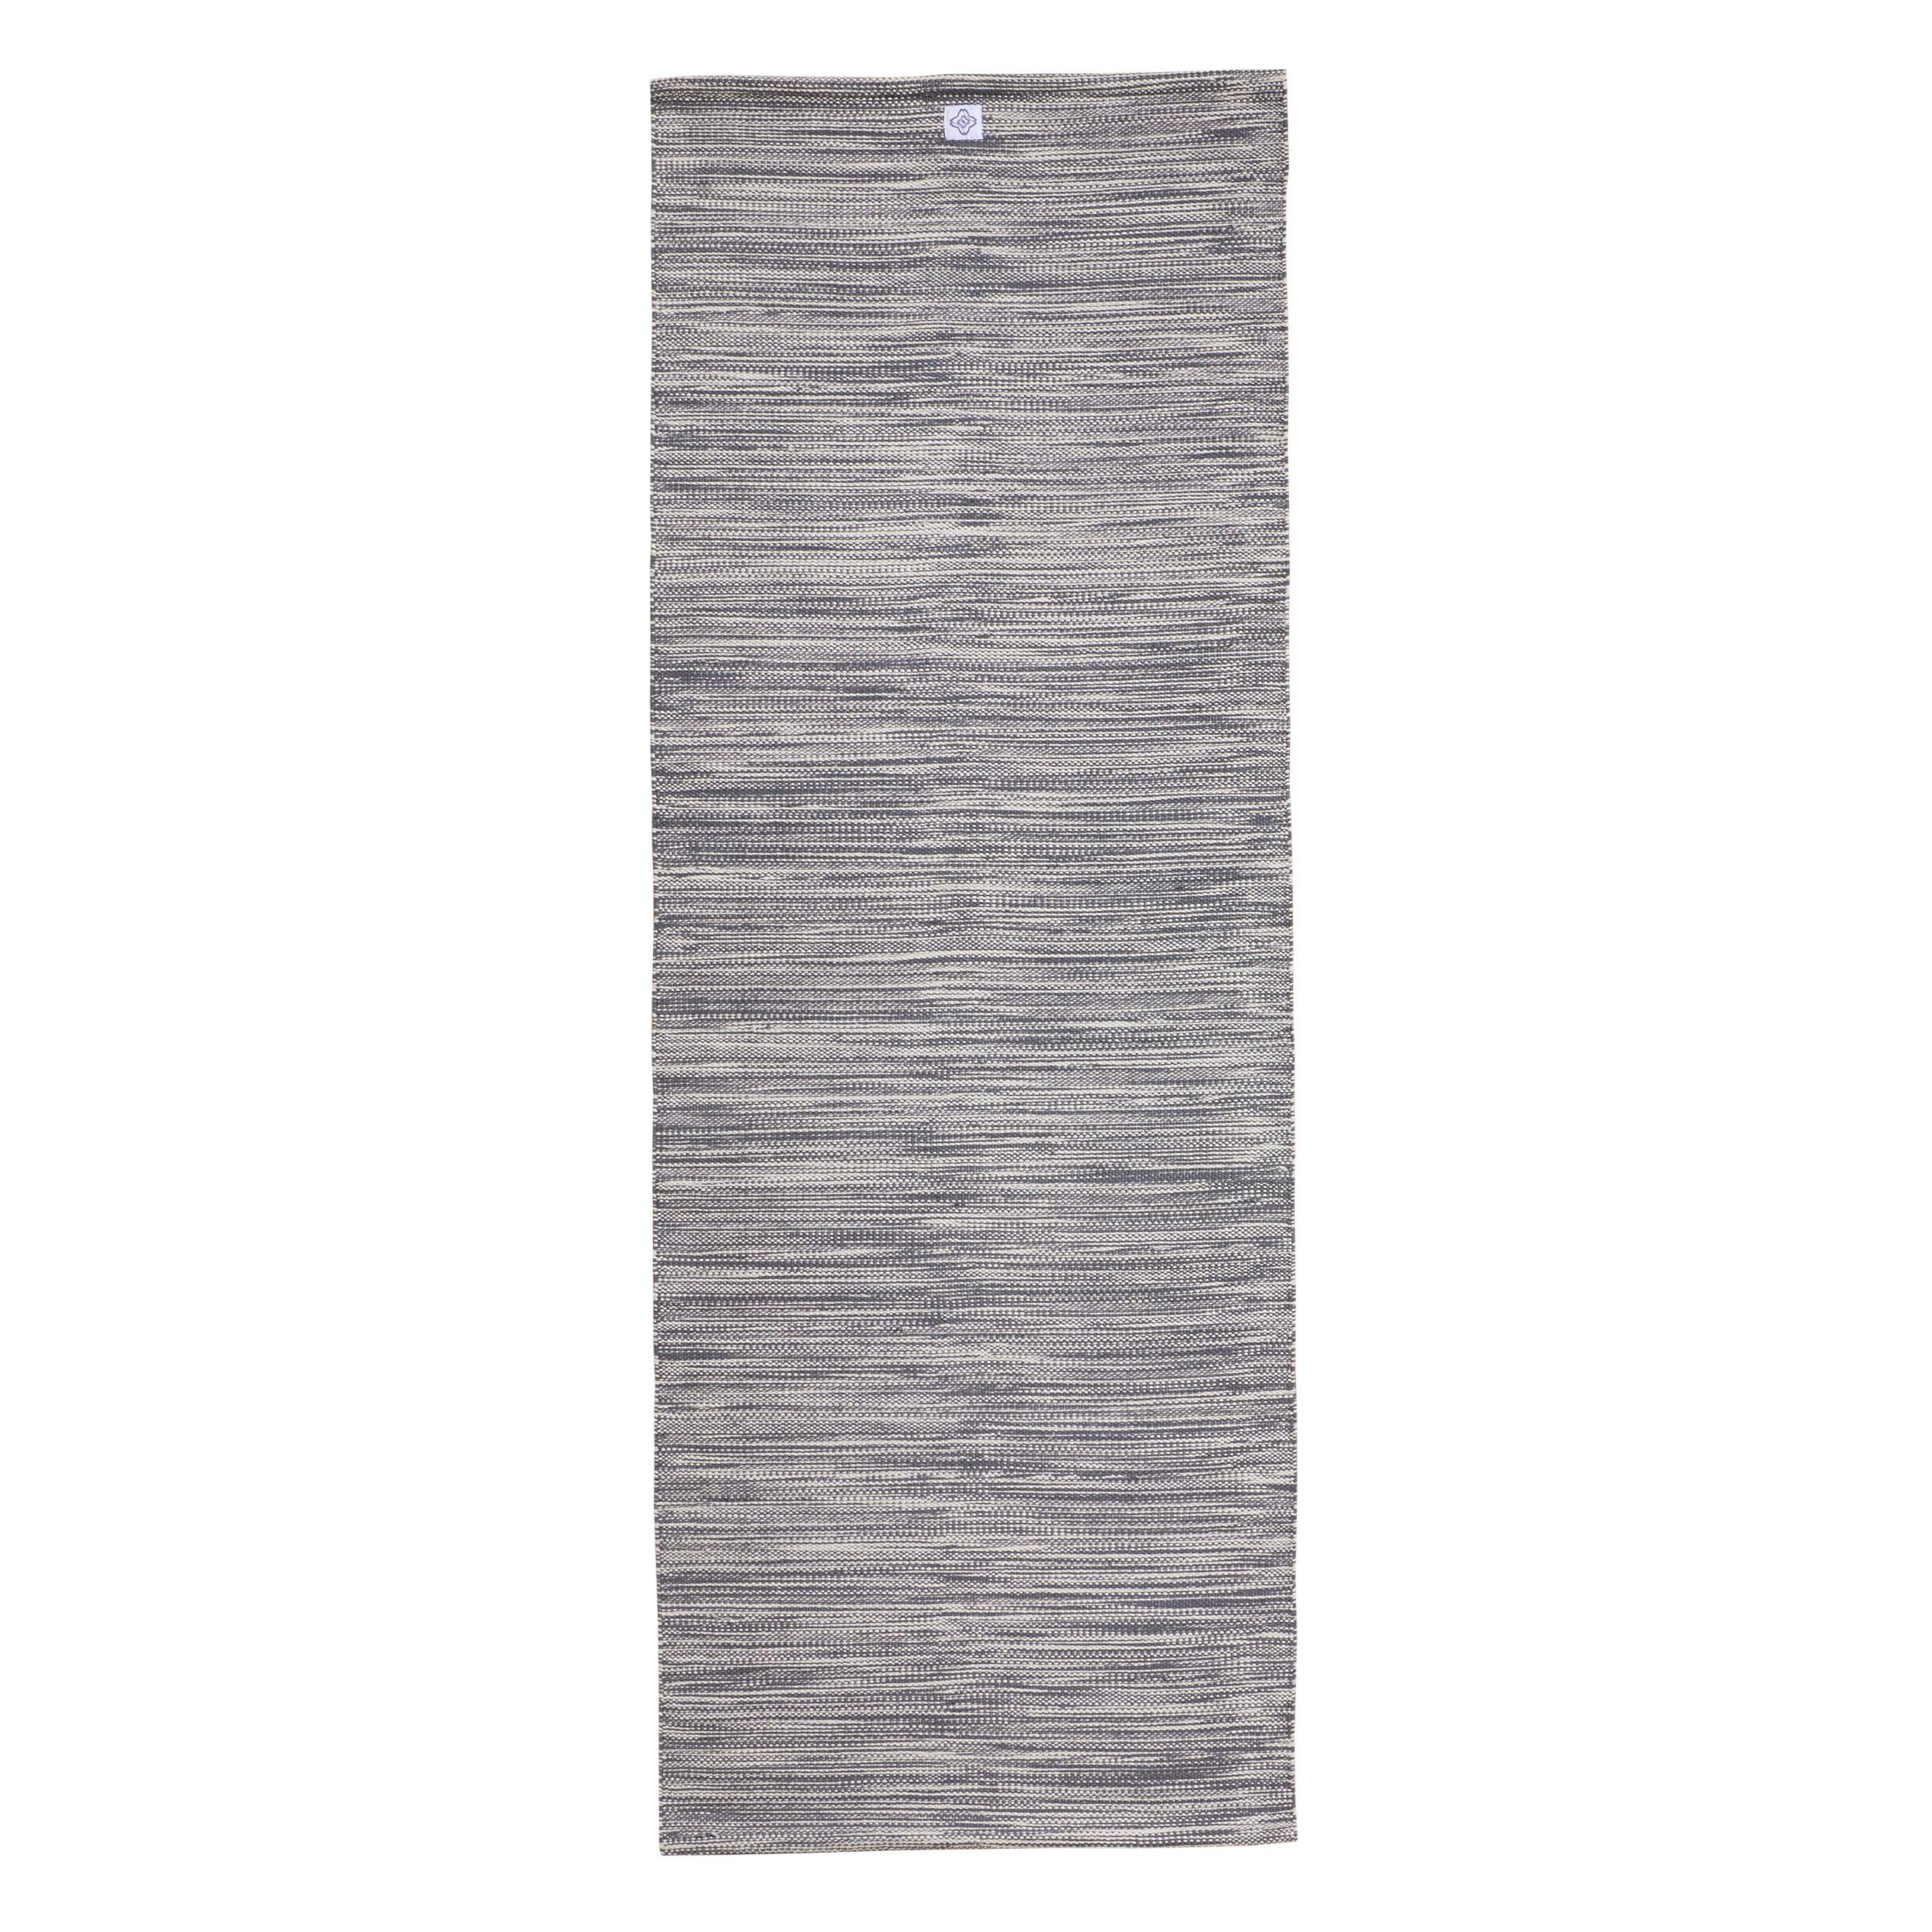 Saltea Yoga 4mm gri imagine